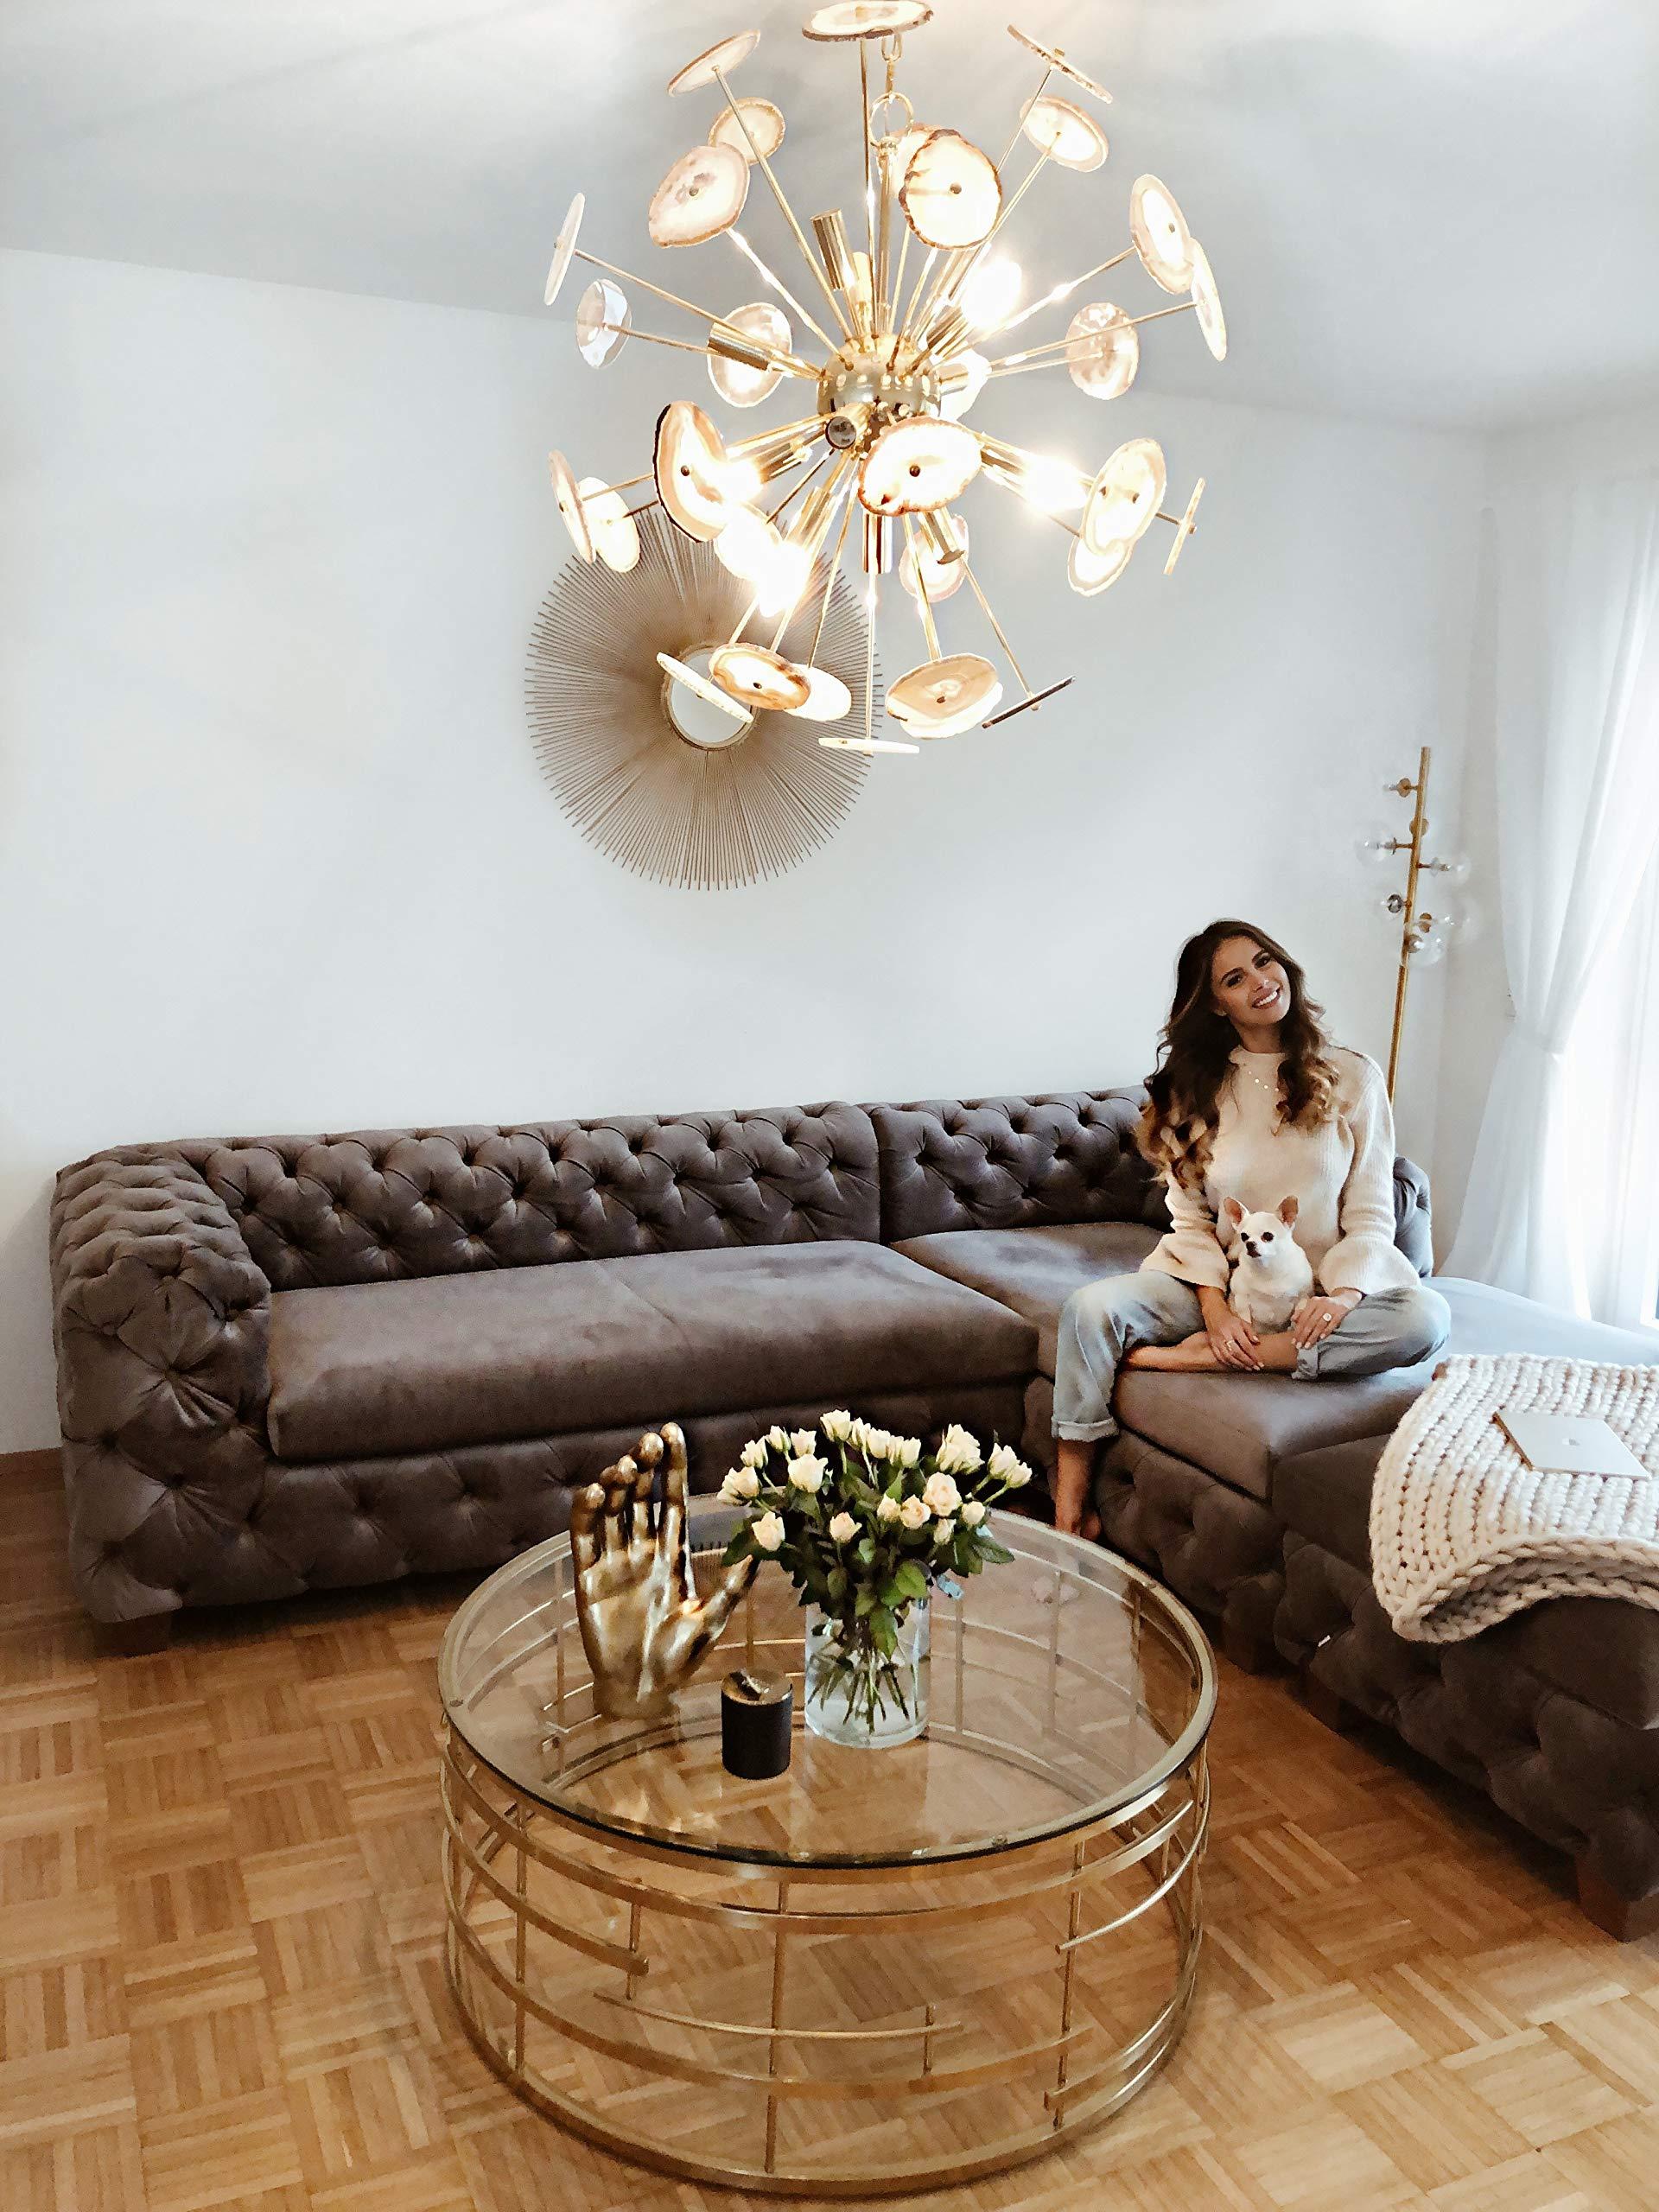 Kare Design Ecksofa Desire Velvet Grau Rechts, Polstersofa, Big Sofa,  Loungesofa, Wohnzimmer Couch, edles Ecksofa, (H/B/T) 72x280x180cm